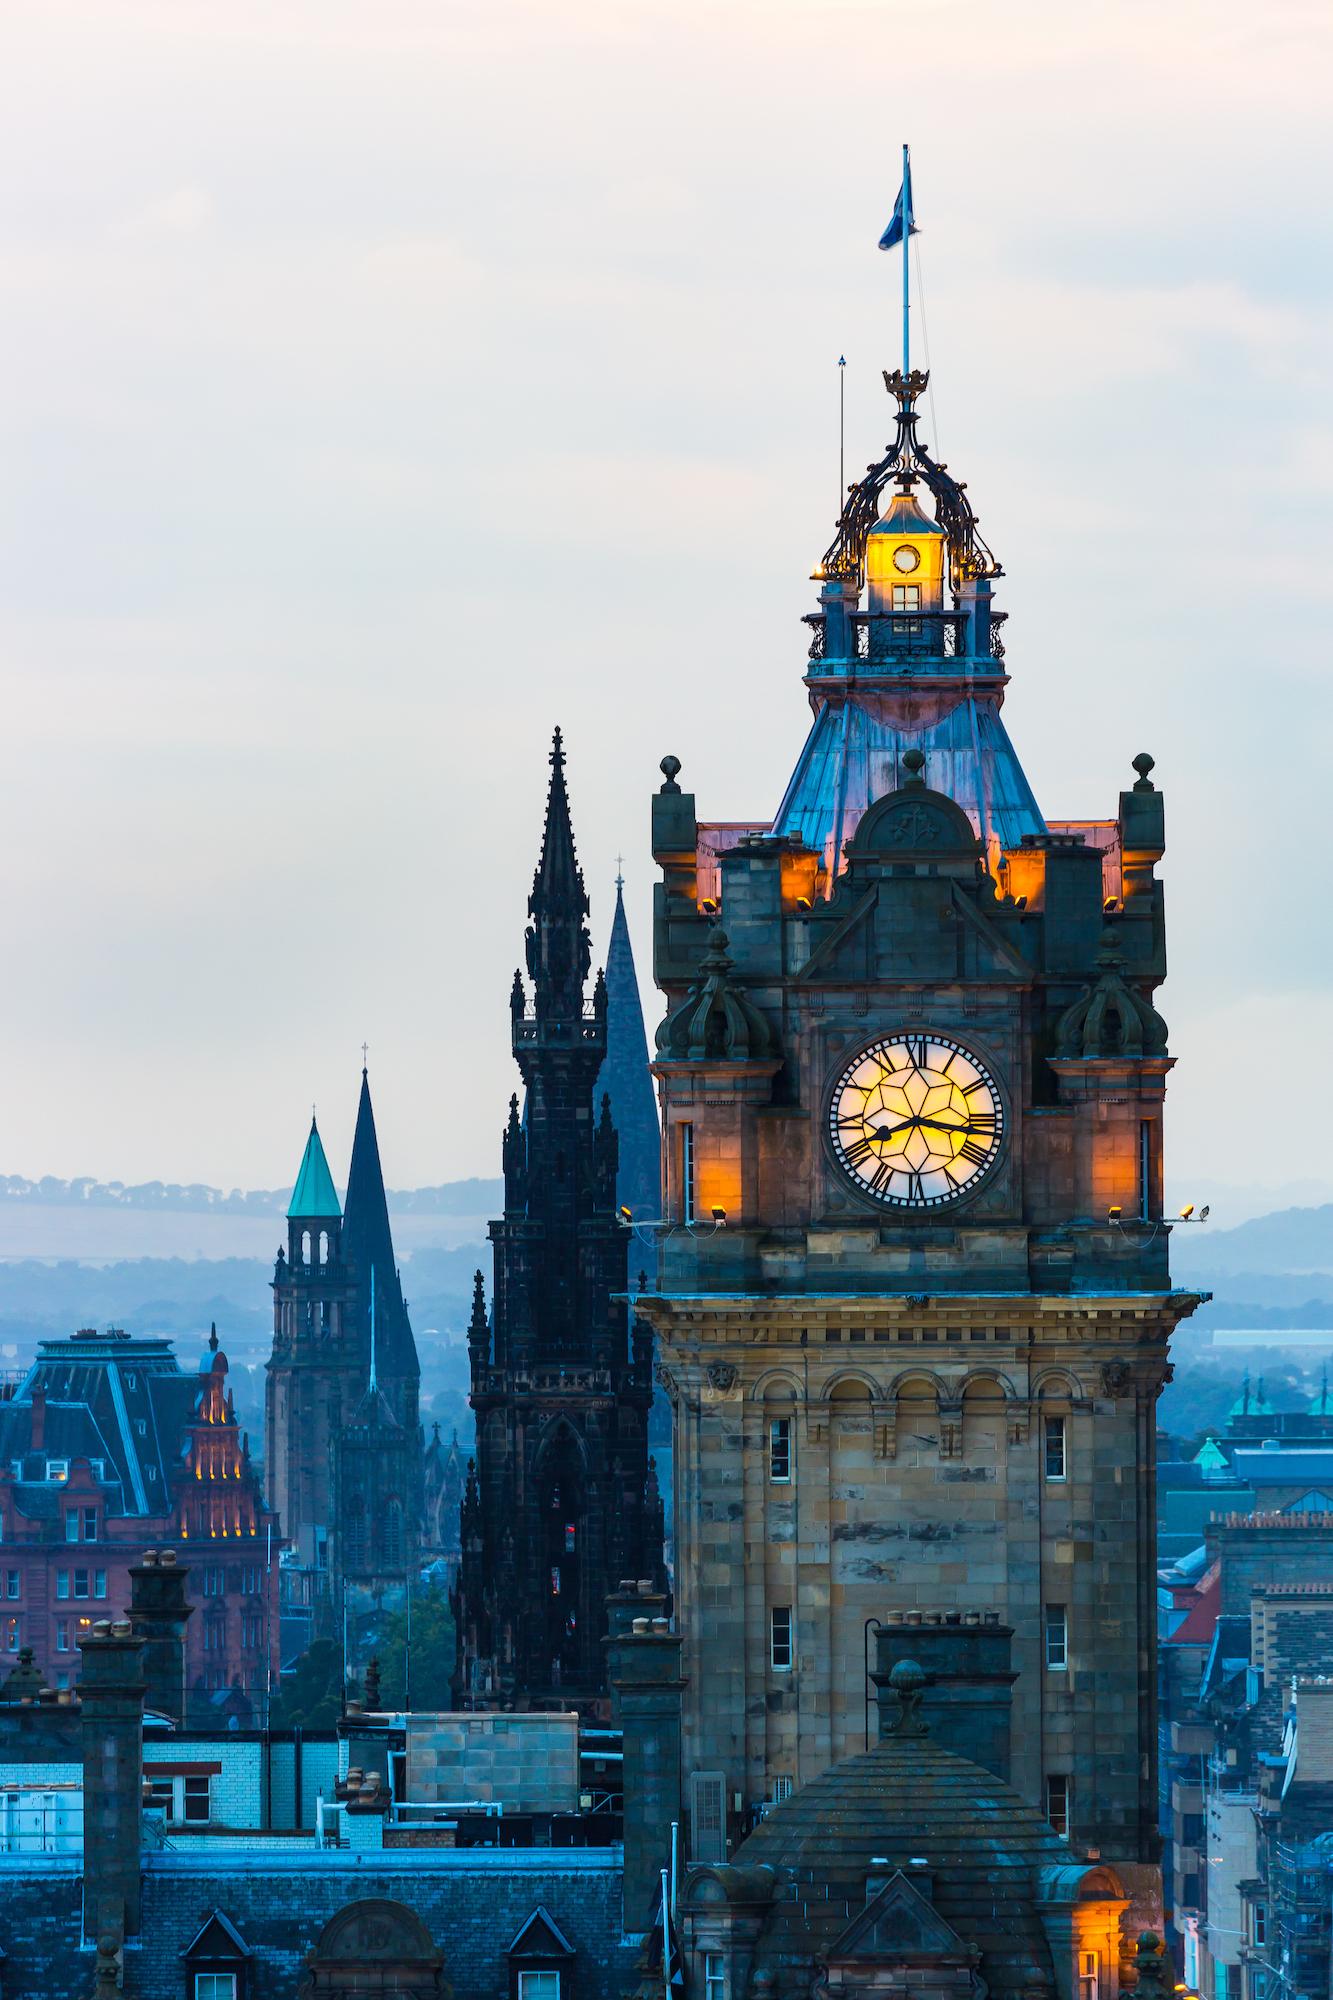 (245) (PO) Five Spires of Balmoral Hotel Clock Tower, Scott Monument, St John's Church, Charlotte Chapel and St Mary's Cathedral, Edinburgh, Scotland.jpg